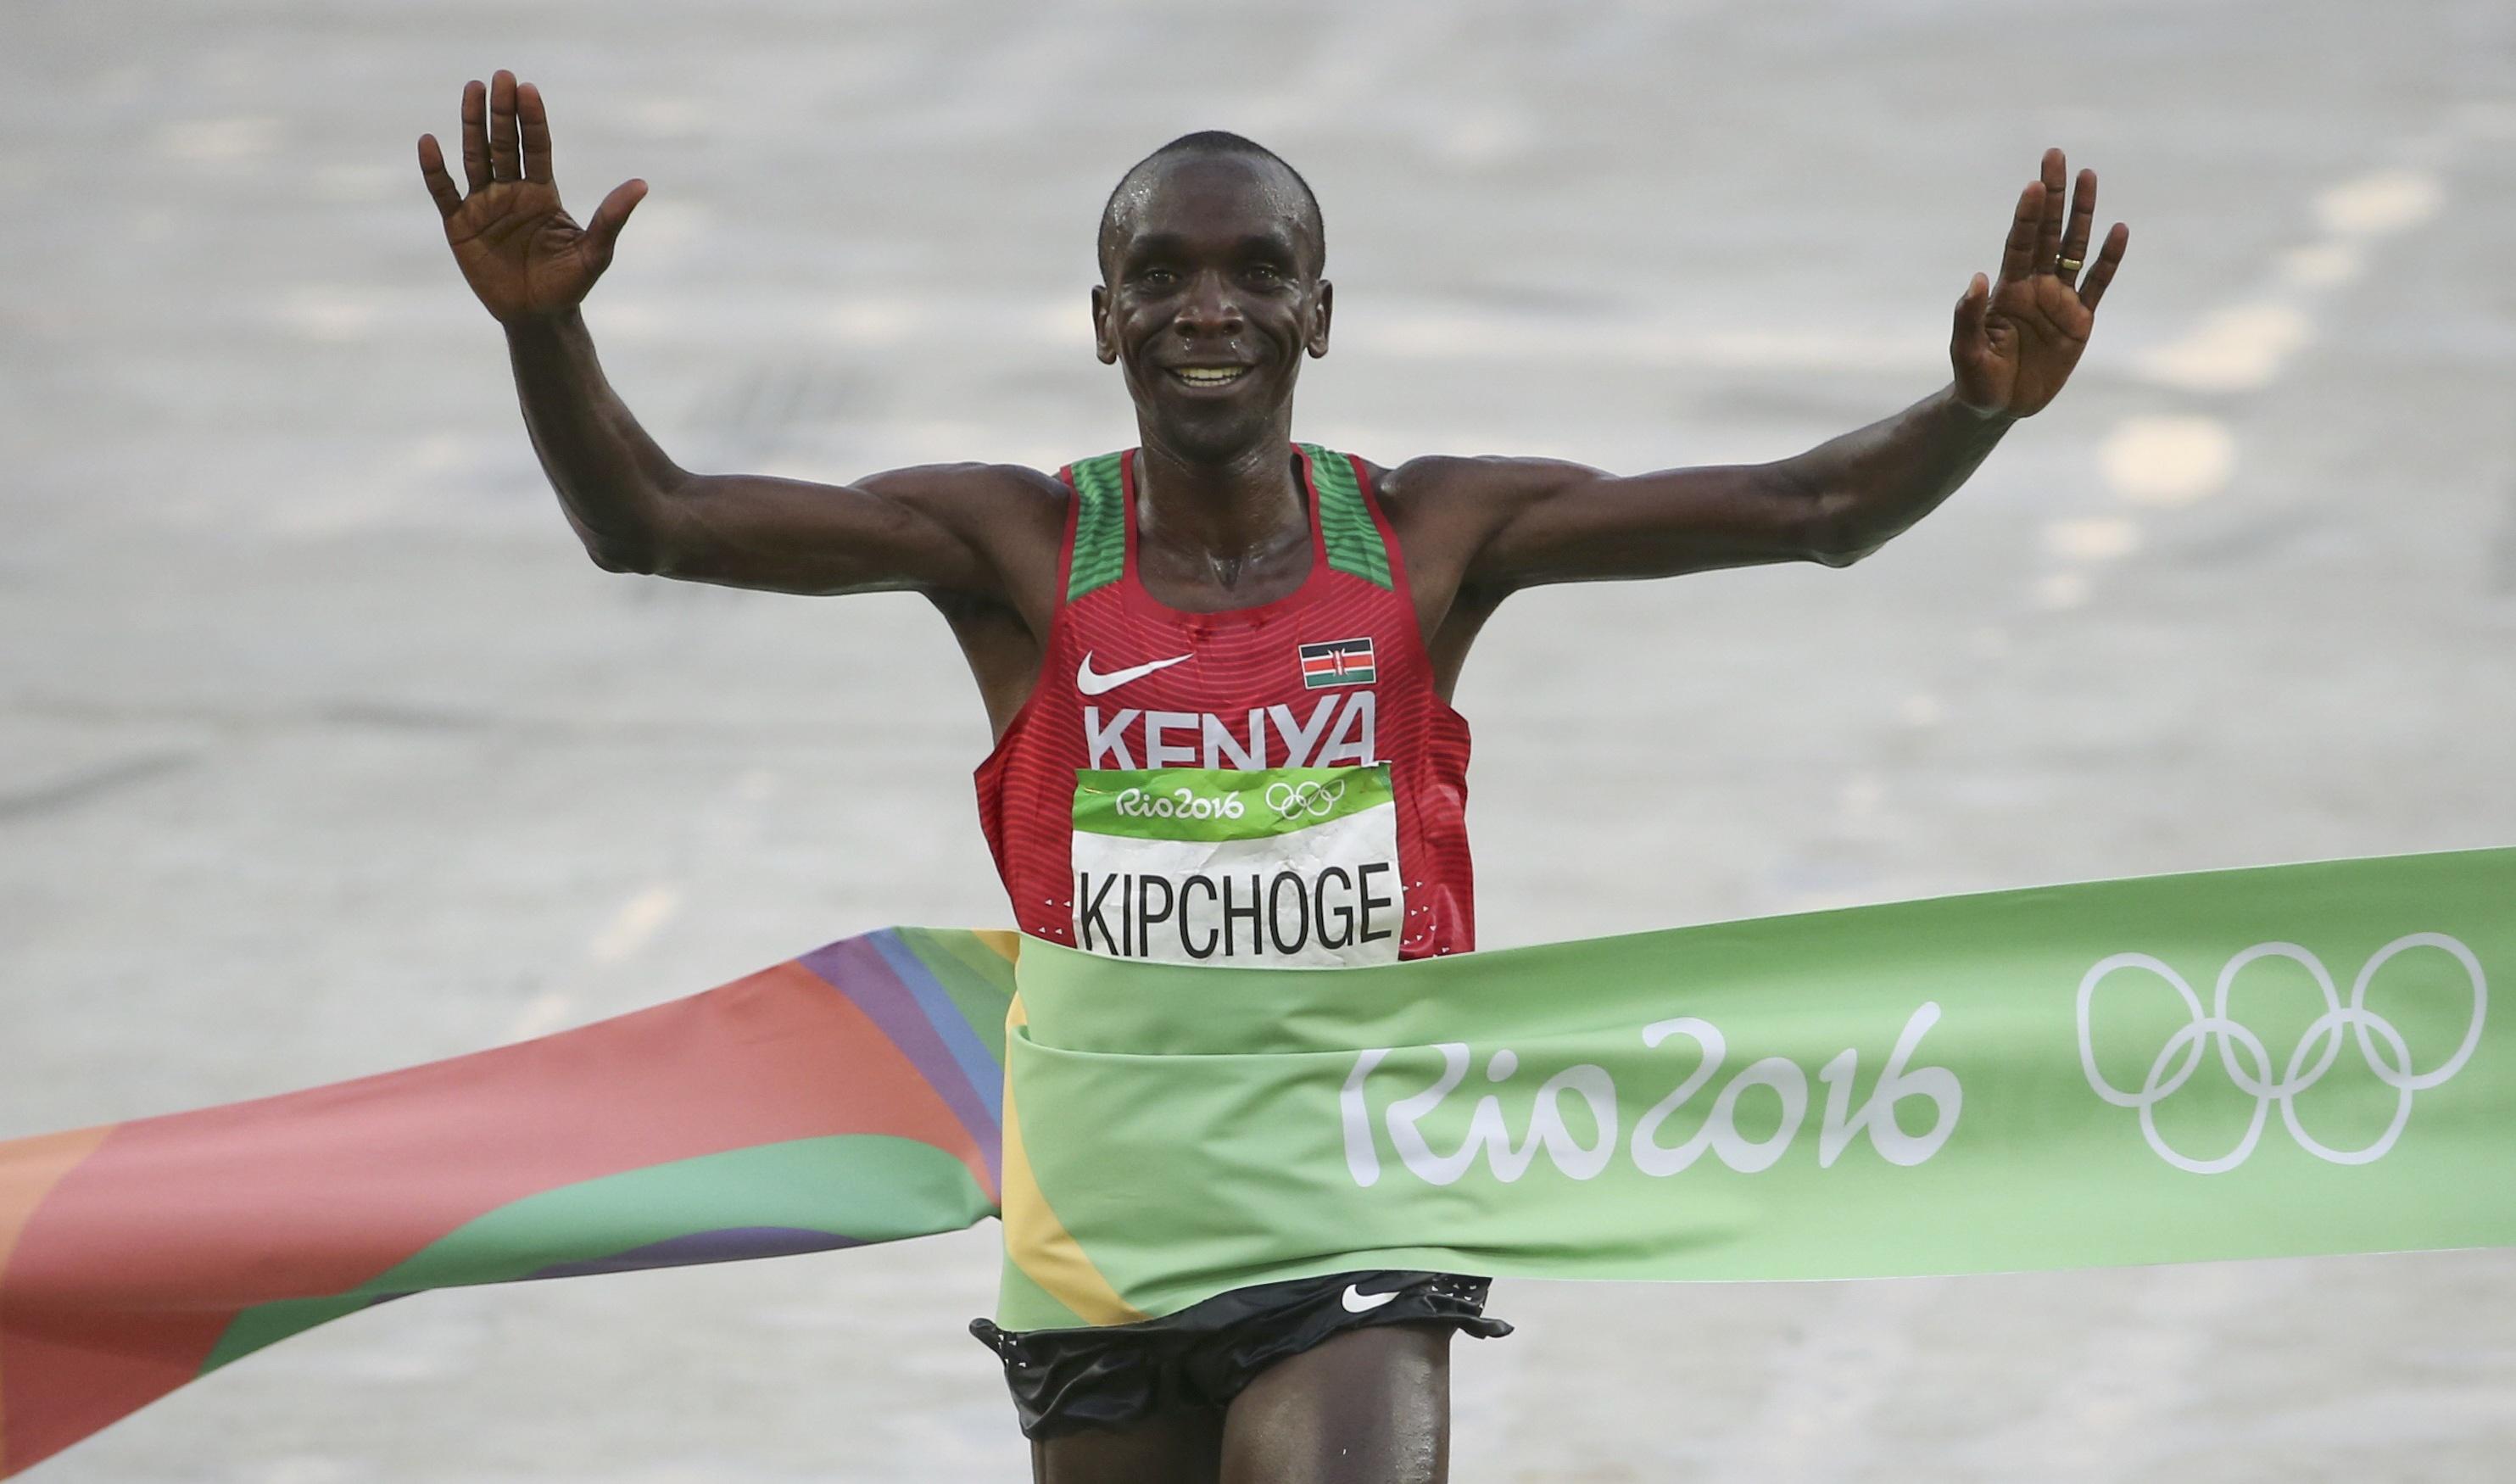 2016 Rio Olympics - Rio de Janeiro, Brasil - Eliud Kipchoge (KEN) vence maratona - Foto de GSC / ADHM